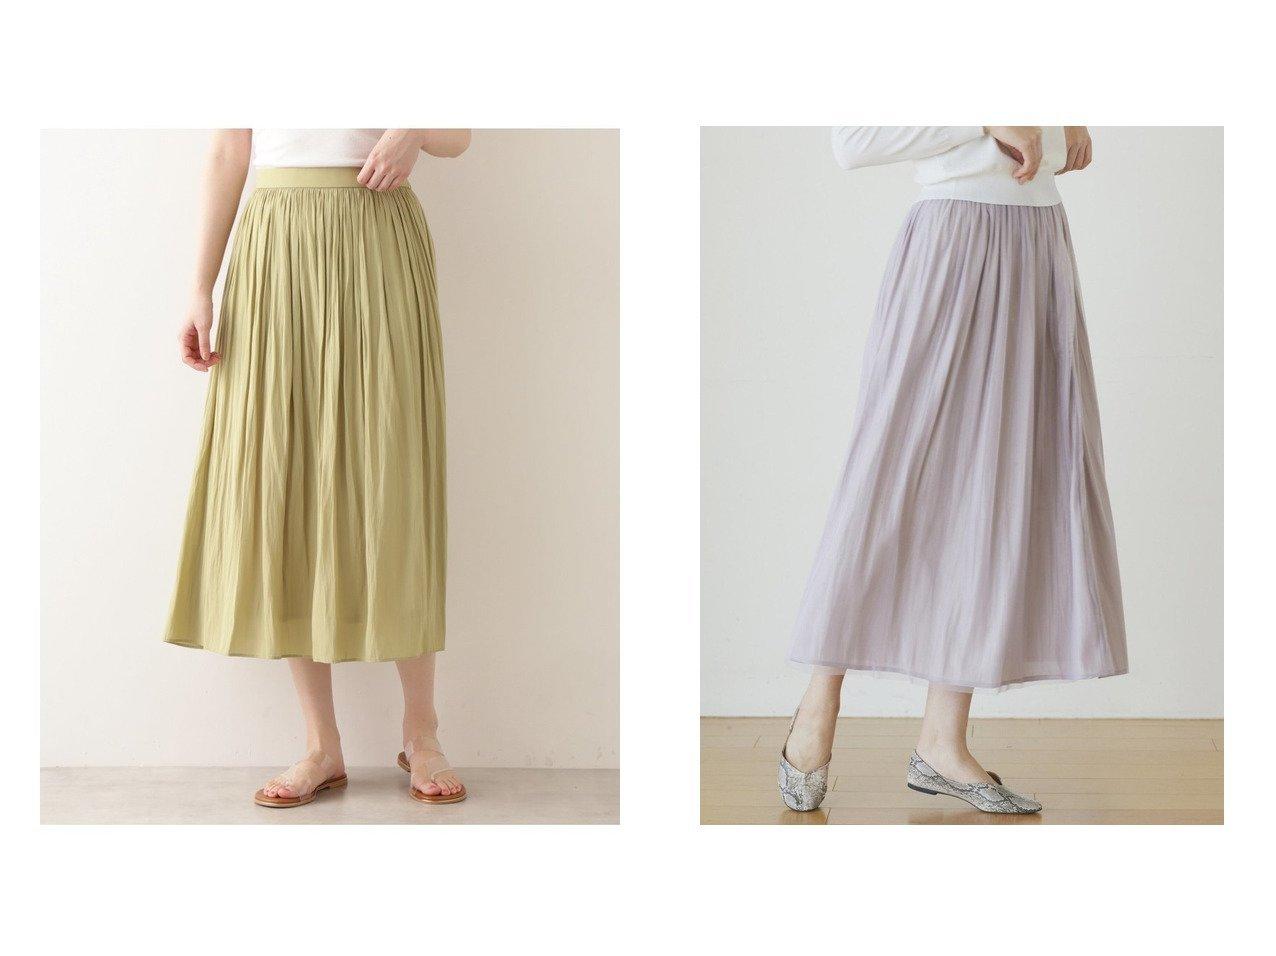 【Ketty/ケティ】のリバーシブルシャイニースカート&【NATURAL BEAUTY BASIC/ナチュラル ビューティー ベーシック】の割繊ギャザースカート 【スカート】おすすめ!人気、トレンド・レディースファッションの通販 おすすめで人気の流行・トレンド、ファッションの通販商品 メンズファッション・キッズファッション・インテリア・家具・レディースファッション・服の通販 founy(ファニー) https://founy.com/ ファッション Fashion レディースファッション WOMEN スカート Skirt ロングスカート Long Skirt ギャザー プリーツ 人気 定番 Standard NEW・新作・新着・新入荷 New Arrivals チュール トレンド ロング |ID:crp329100000035449